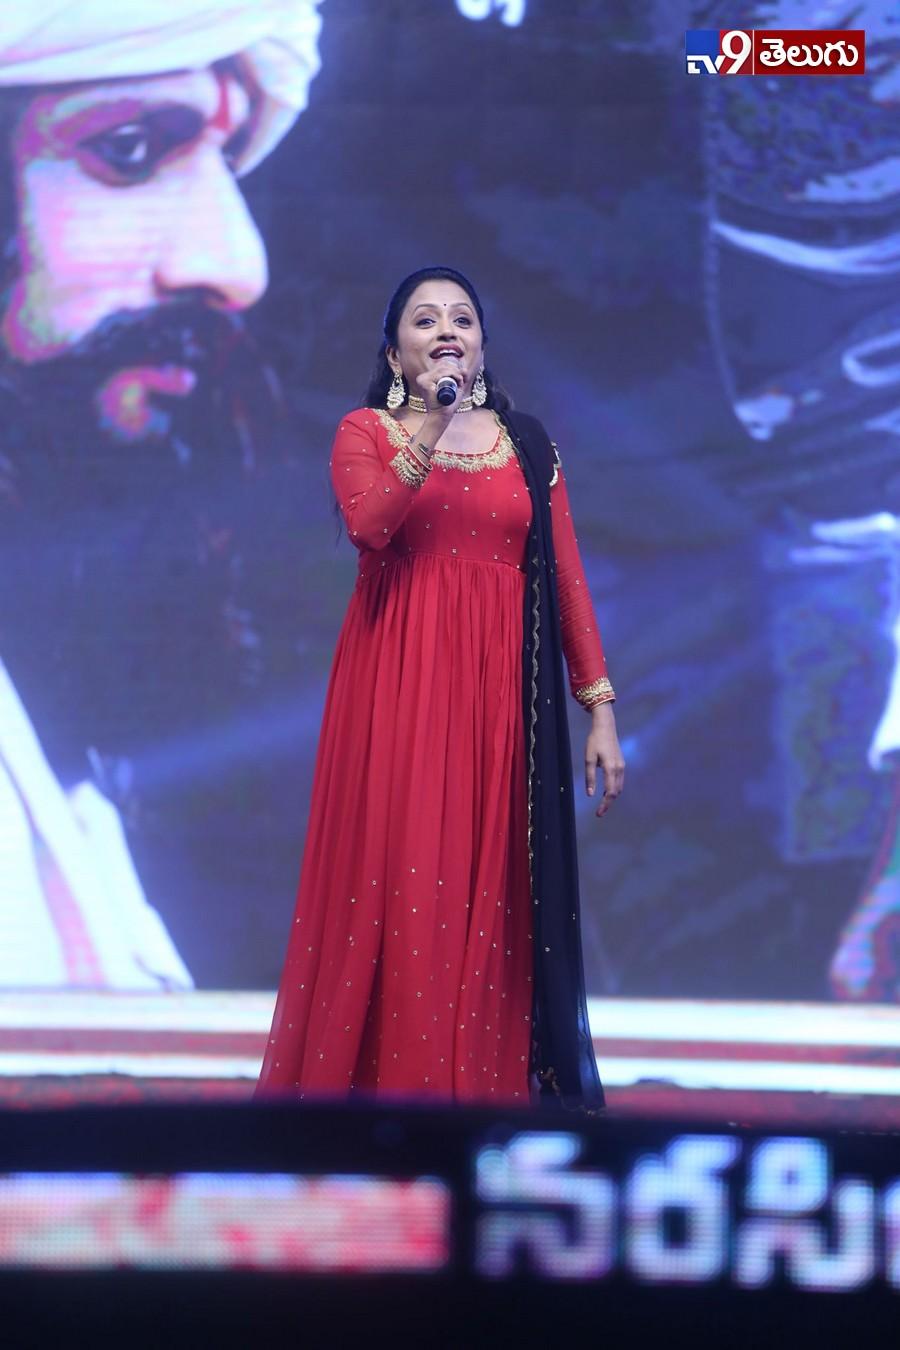 Sye Raa Narasimha Reddy pre release event Photos, మొదలైన సైరా నరసింహ రెడ్డి హంగామా